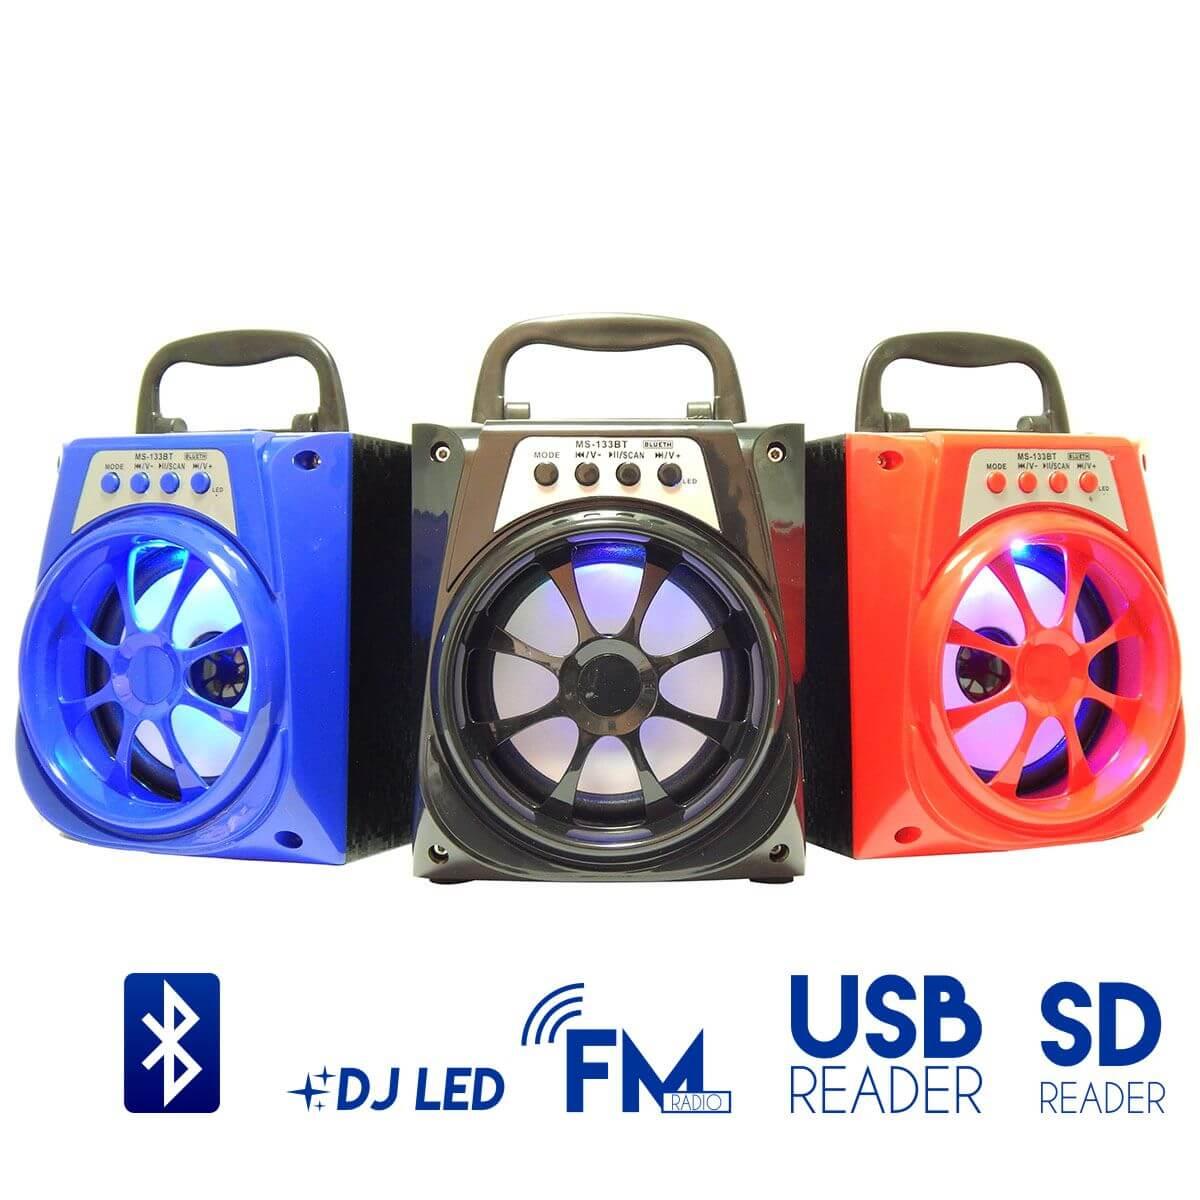 Caixa de Som 8 Watts Rms Bluetooth Bateria/Radio/SD/USB MS-133BT